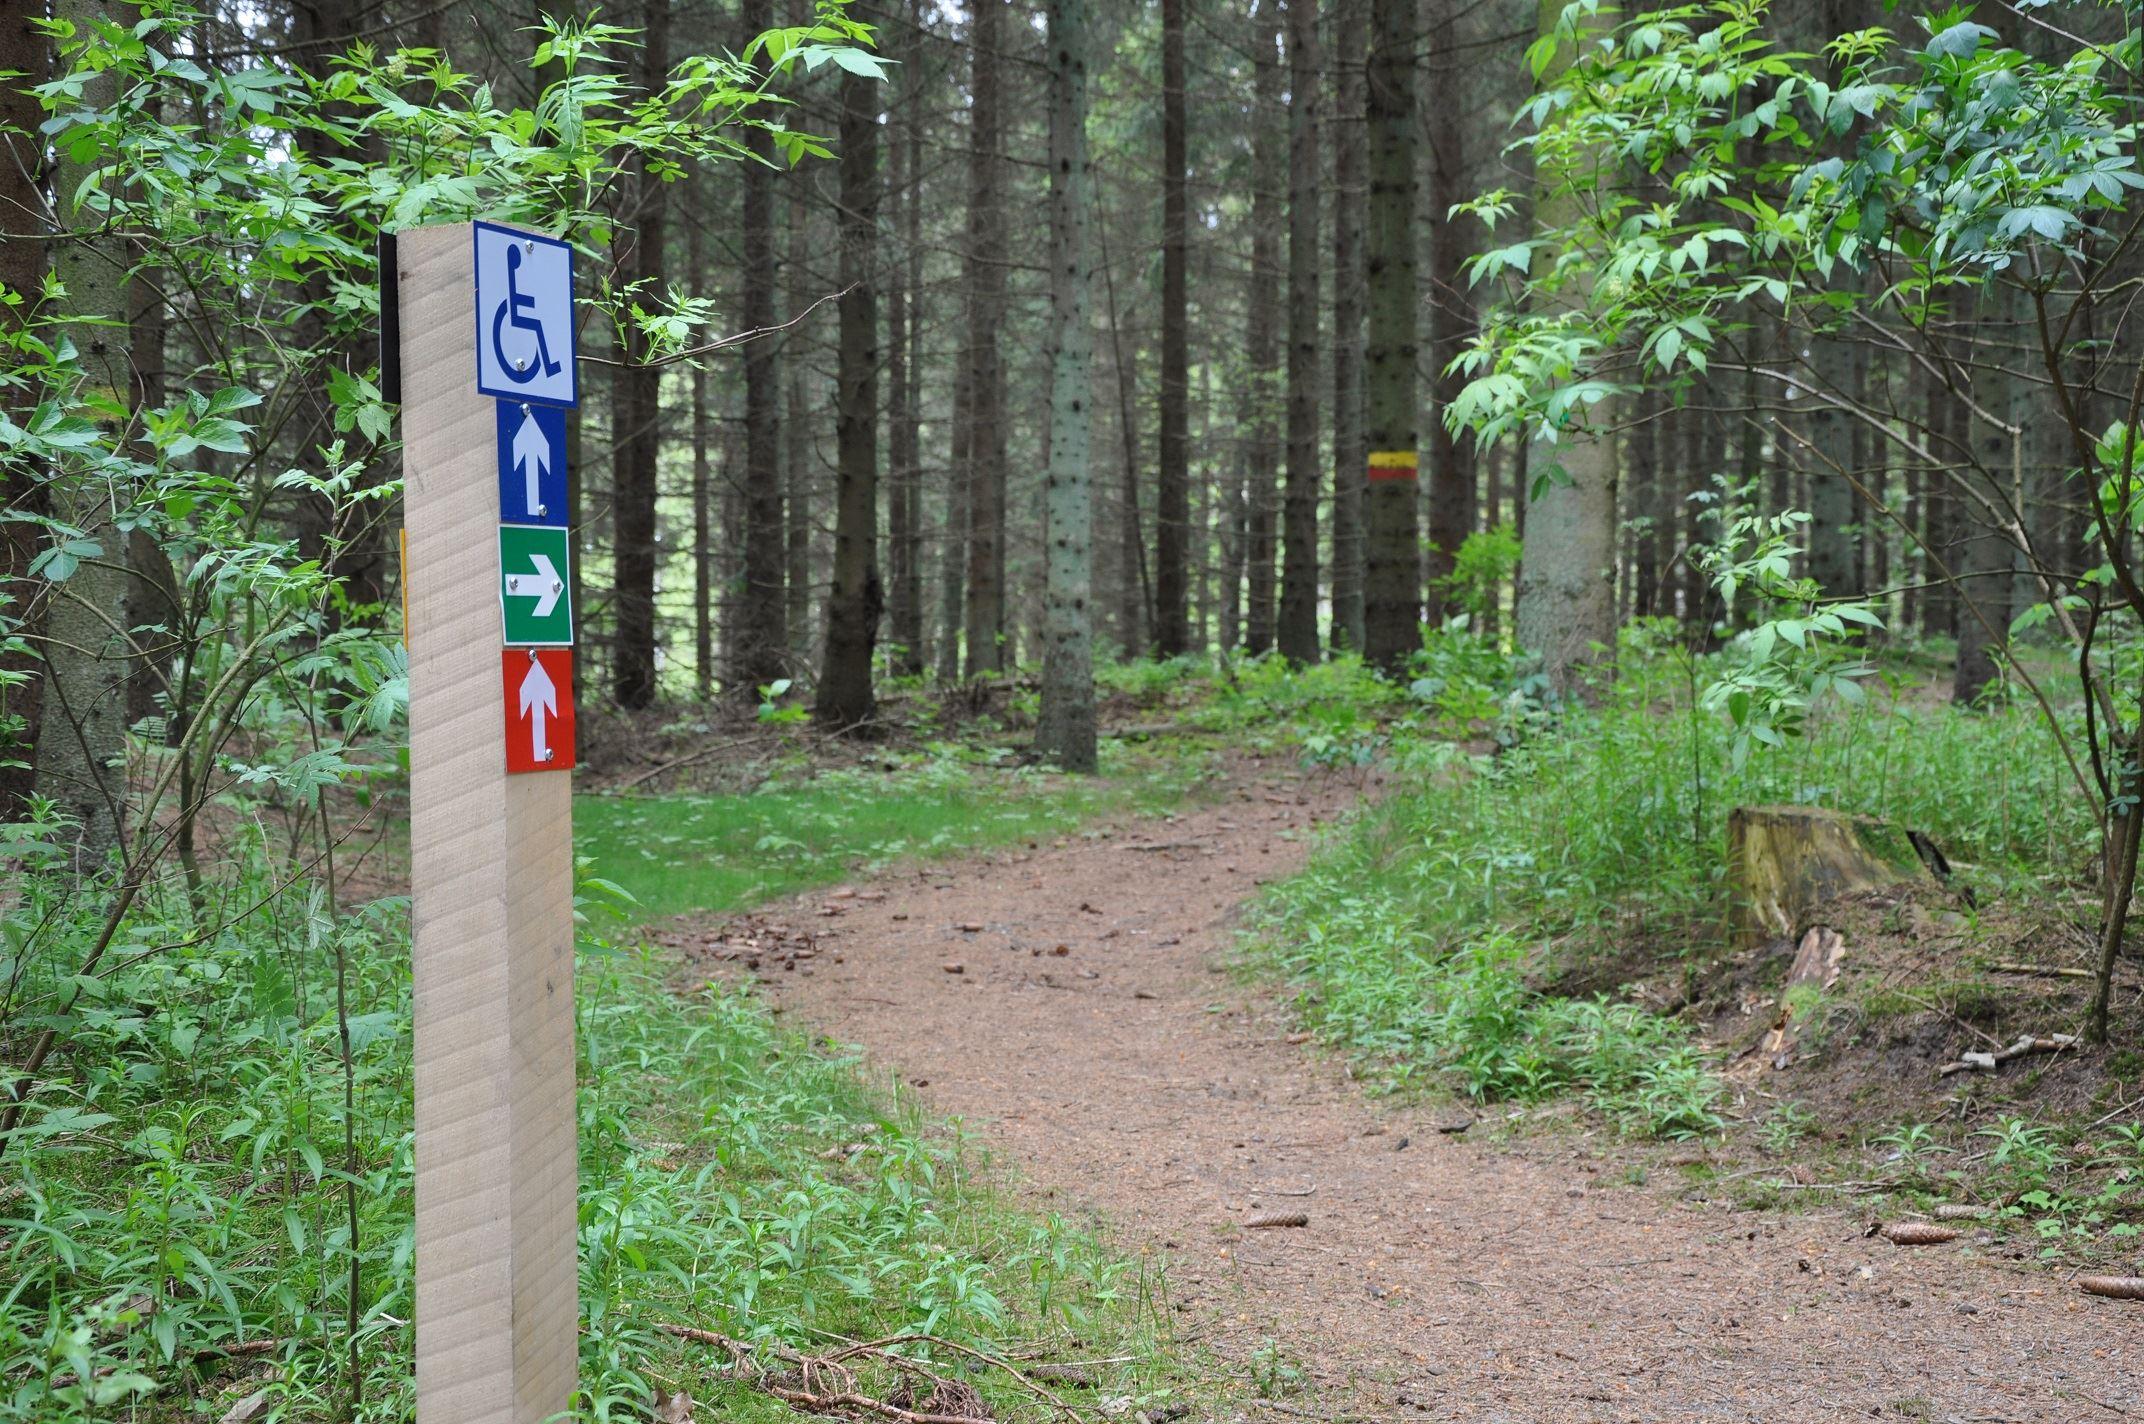 © Tomelilla kommun, Kronoskogen - Vandreture - Cykel